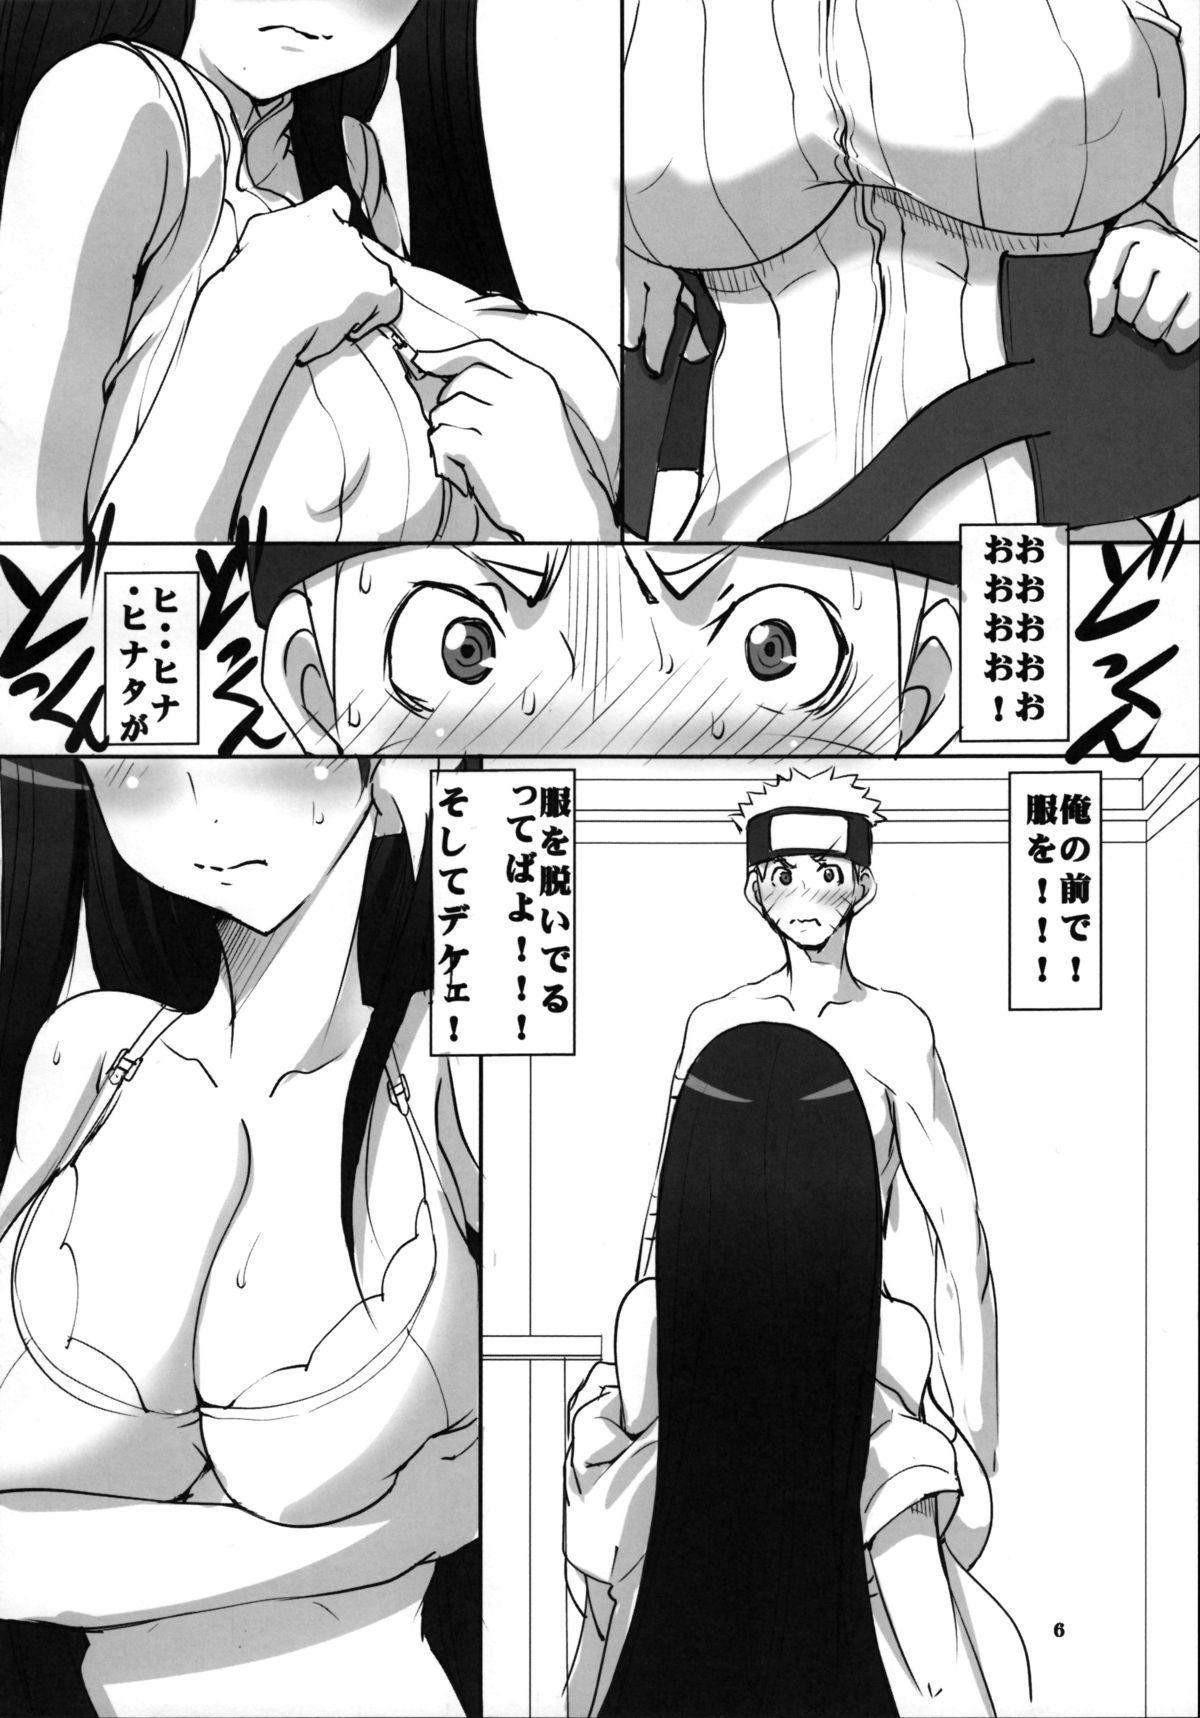 (C89) [Algolagnia (Mikoshiro Honnin)] Naruto [saga] sei (NARUTO) 5